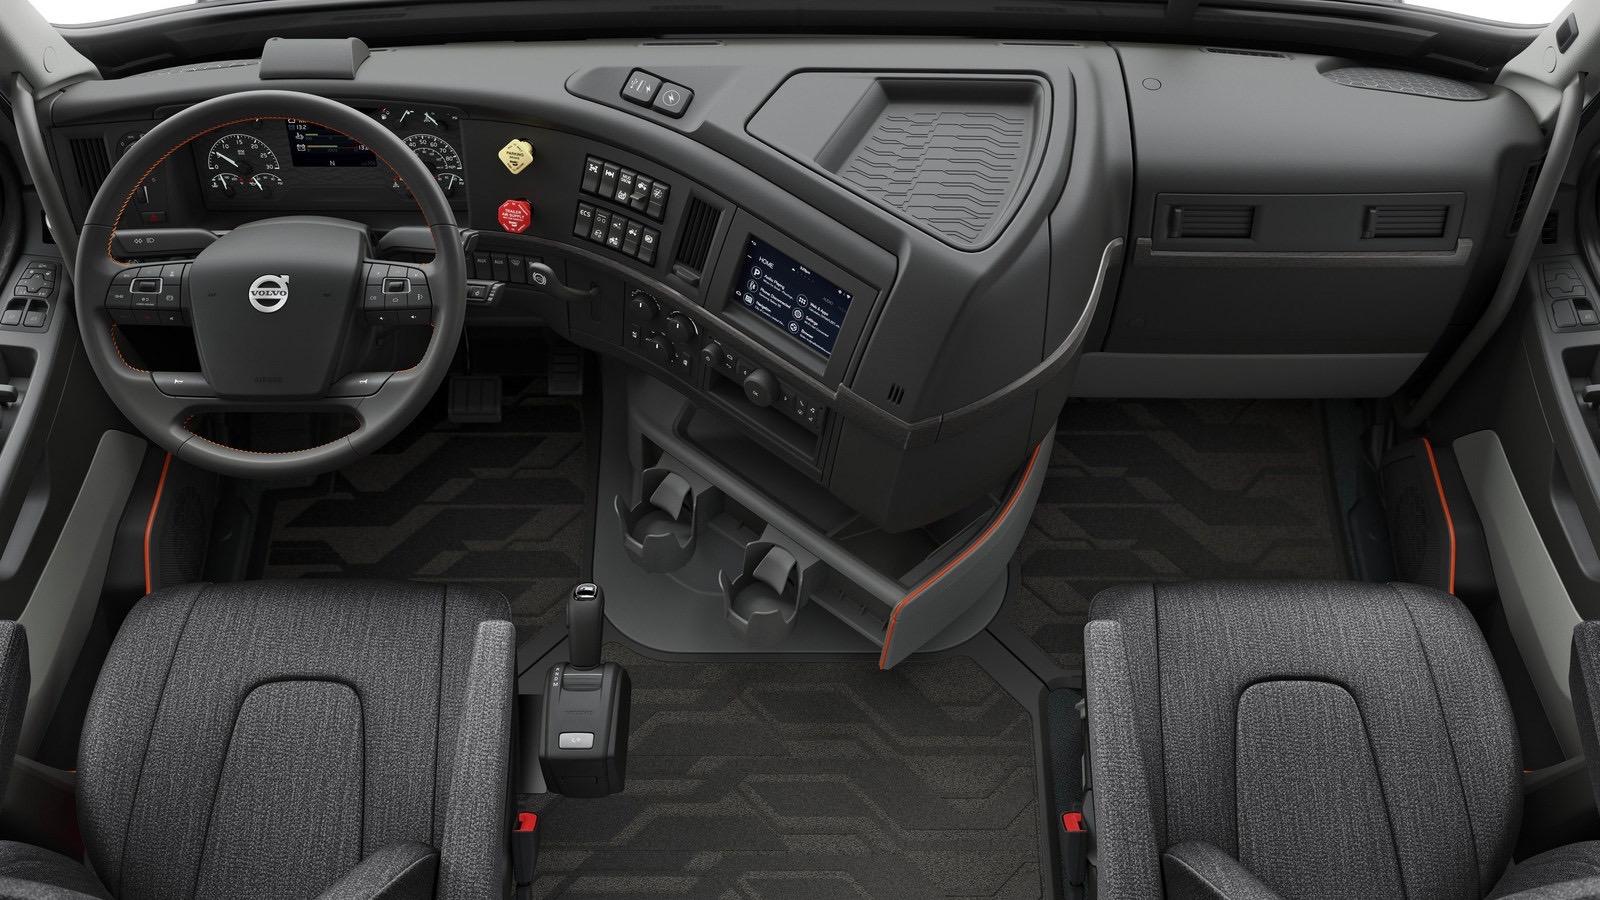 Volvo Brings Apple S Carplay To Its Semi Trucks With New Vnl Series